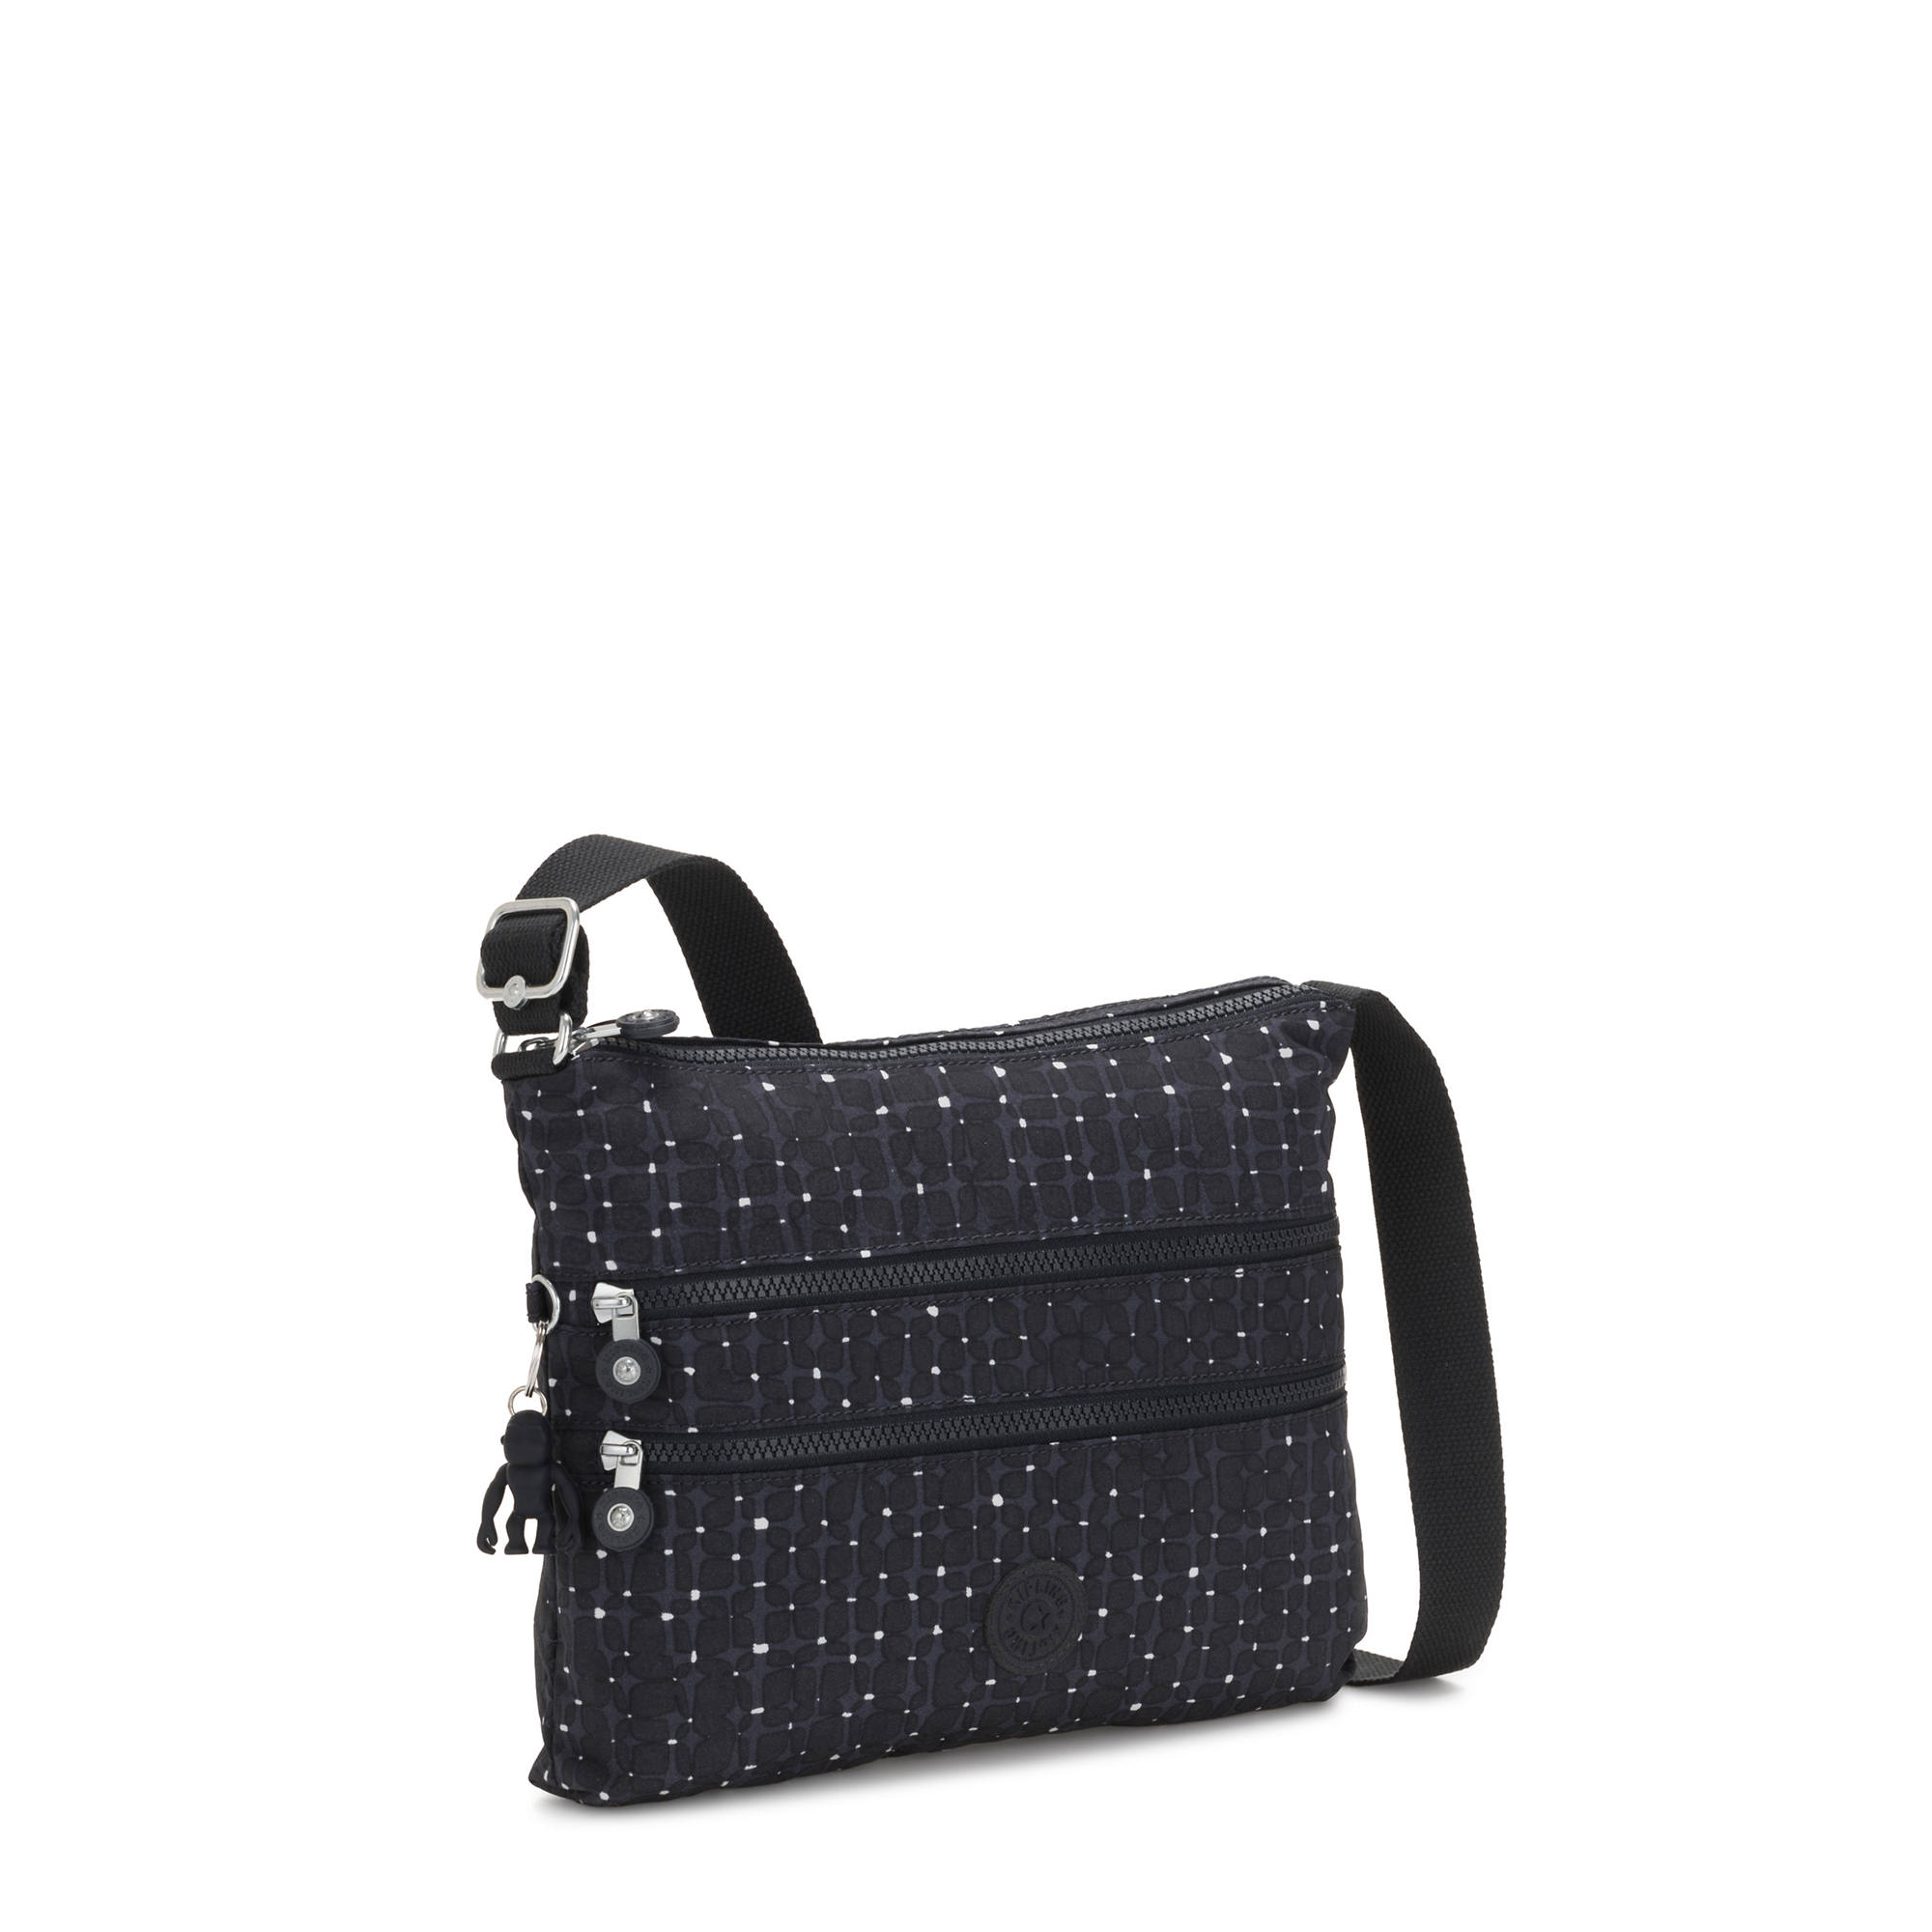 Kipling-Alvar-Metallic-Crossbody-Bag miniature 46